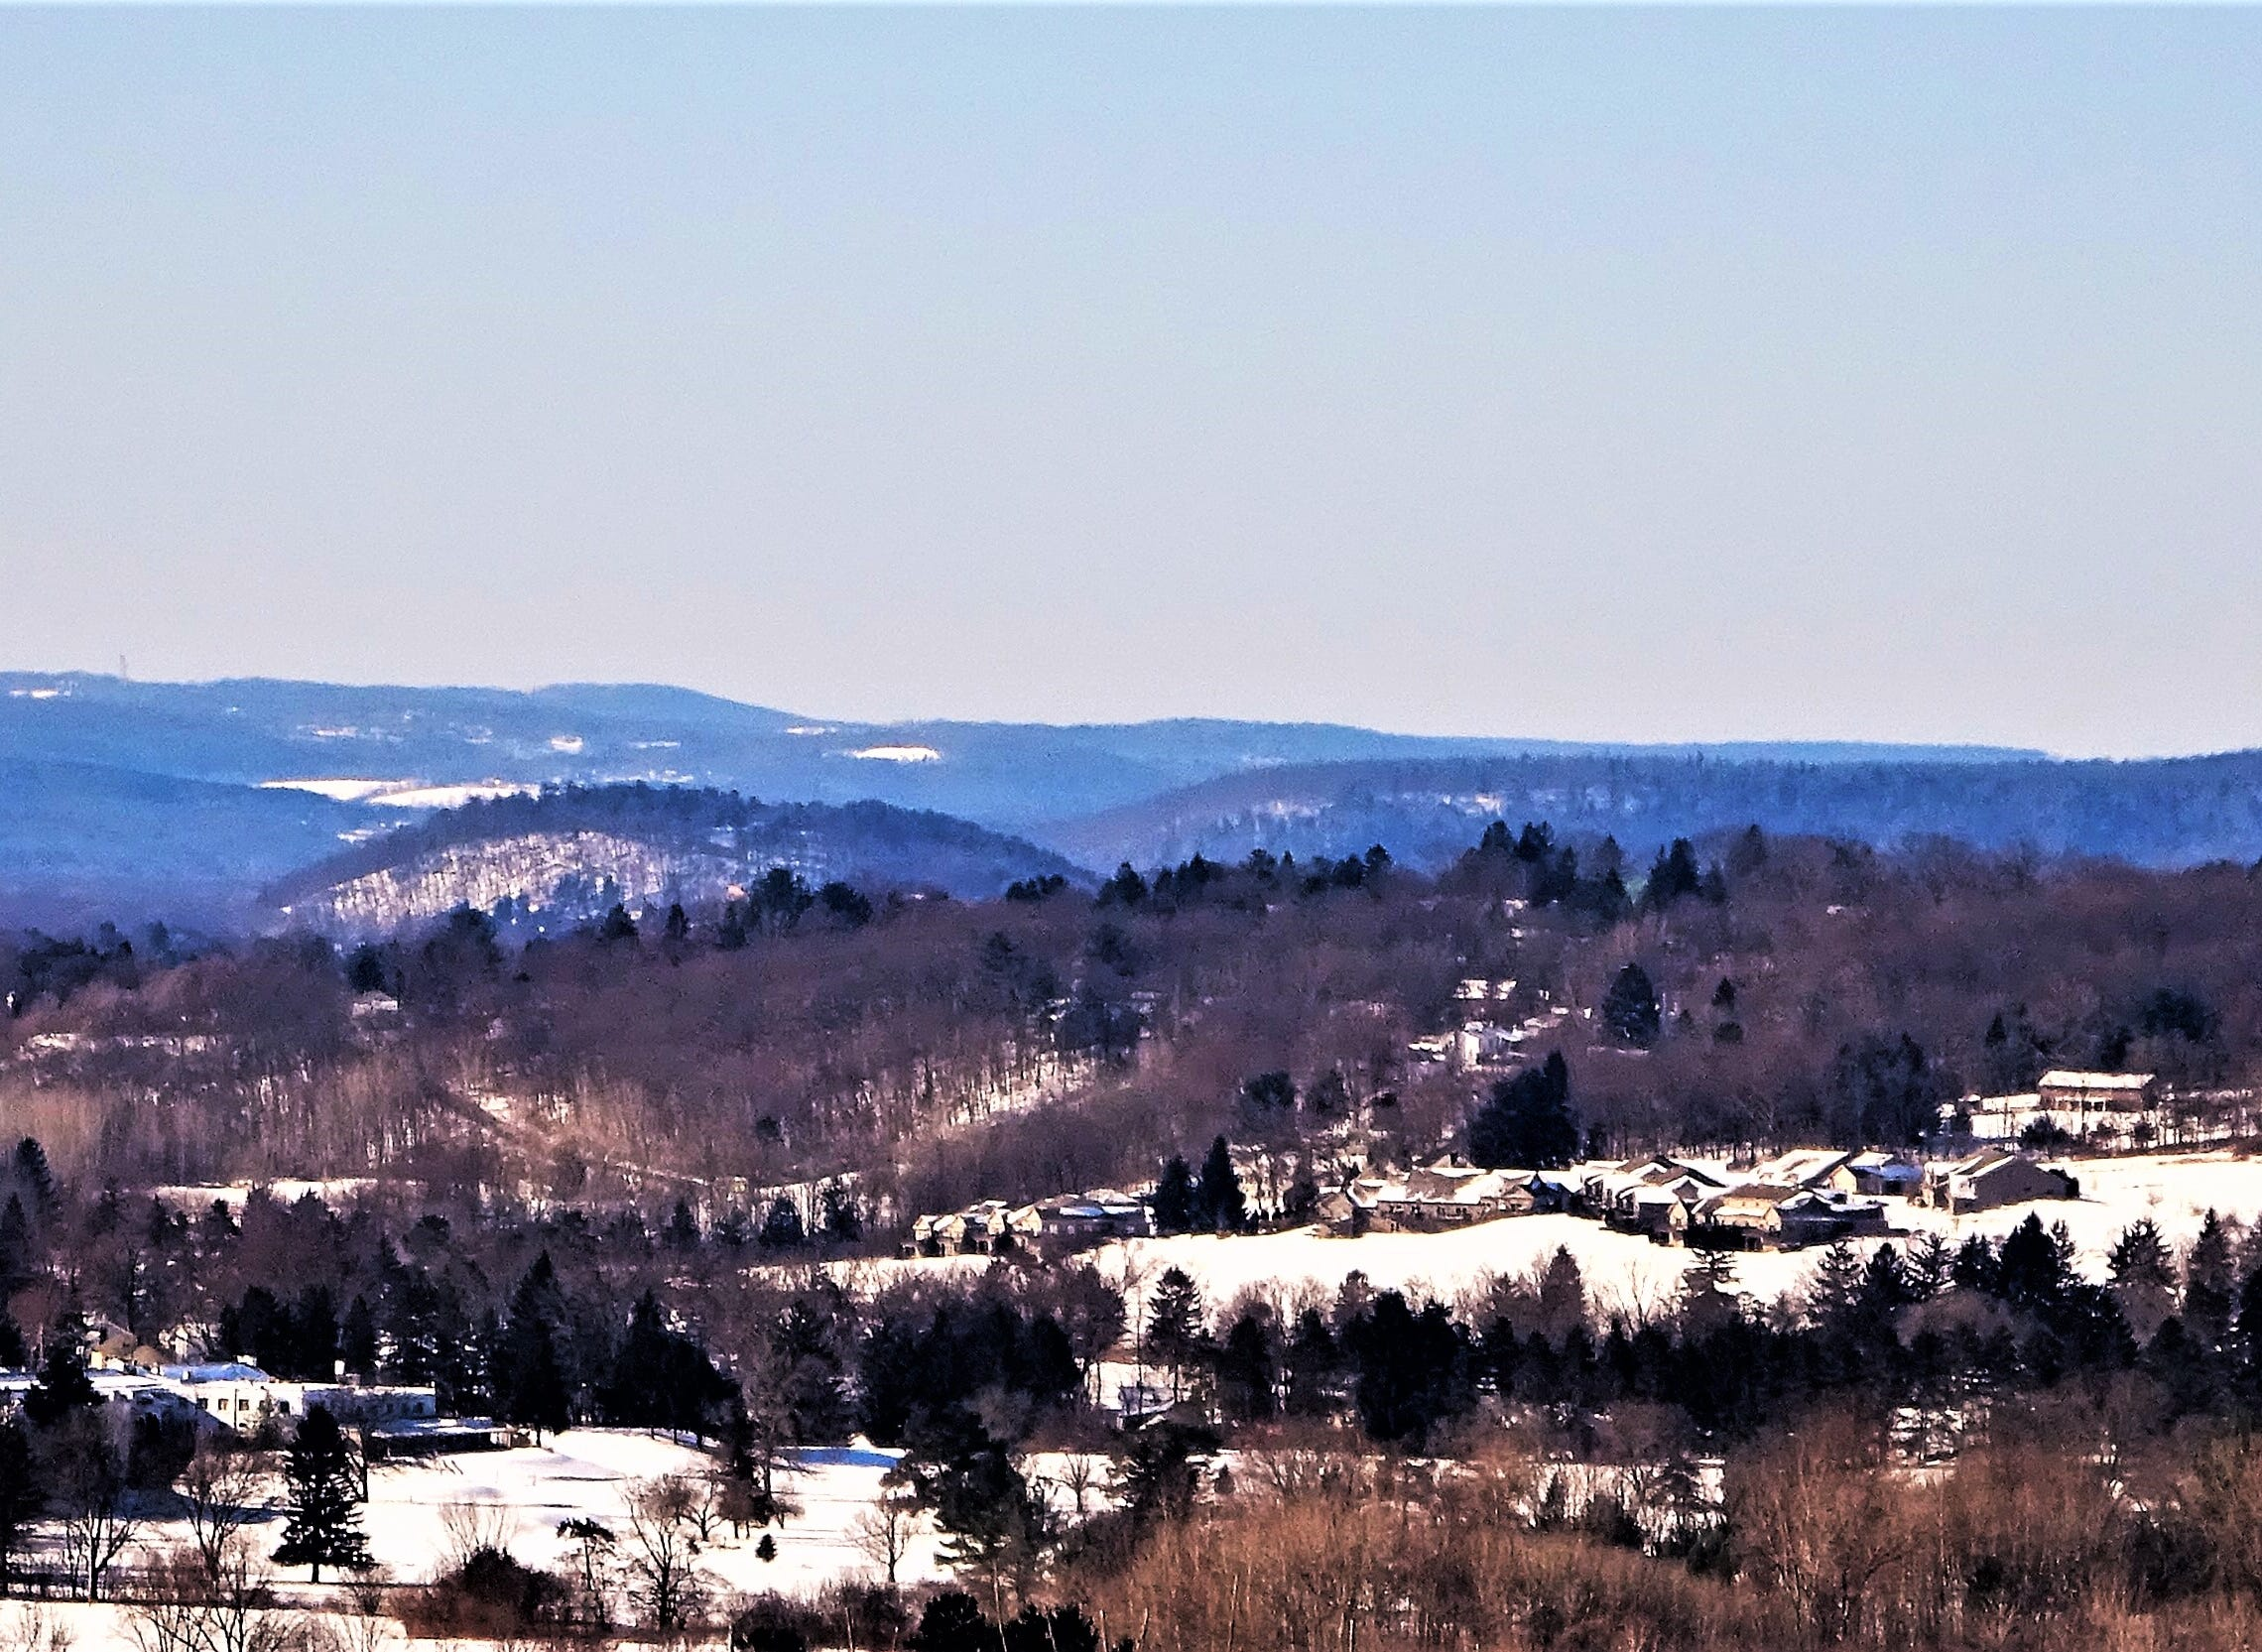 A view from Johnson City toward Endicott.